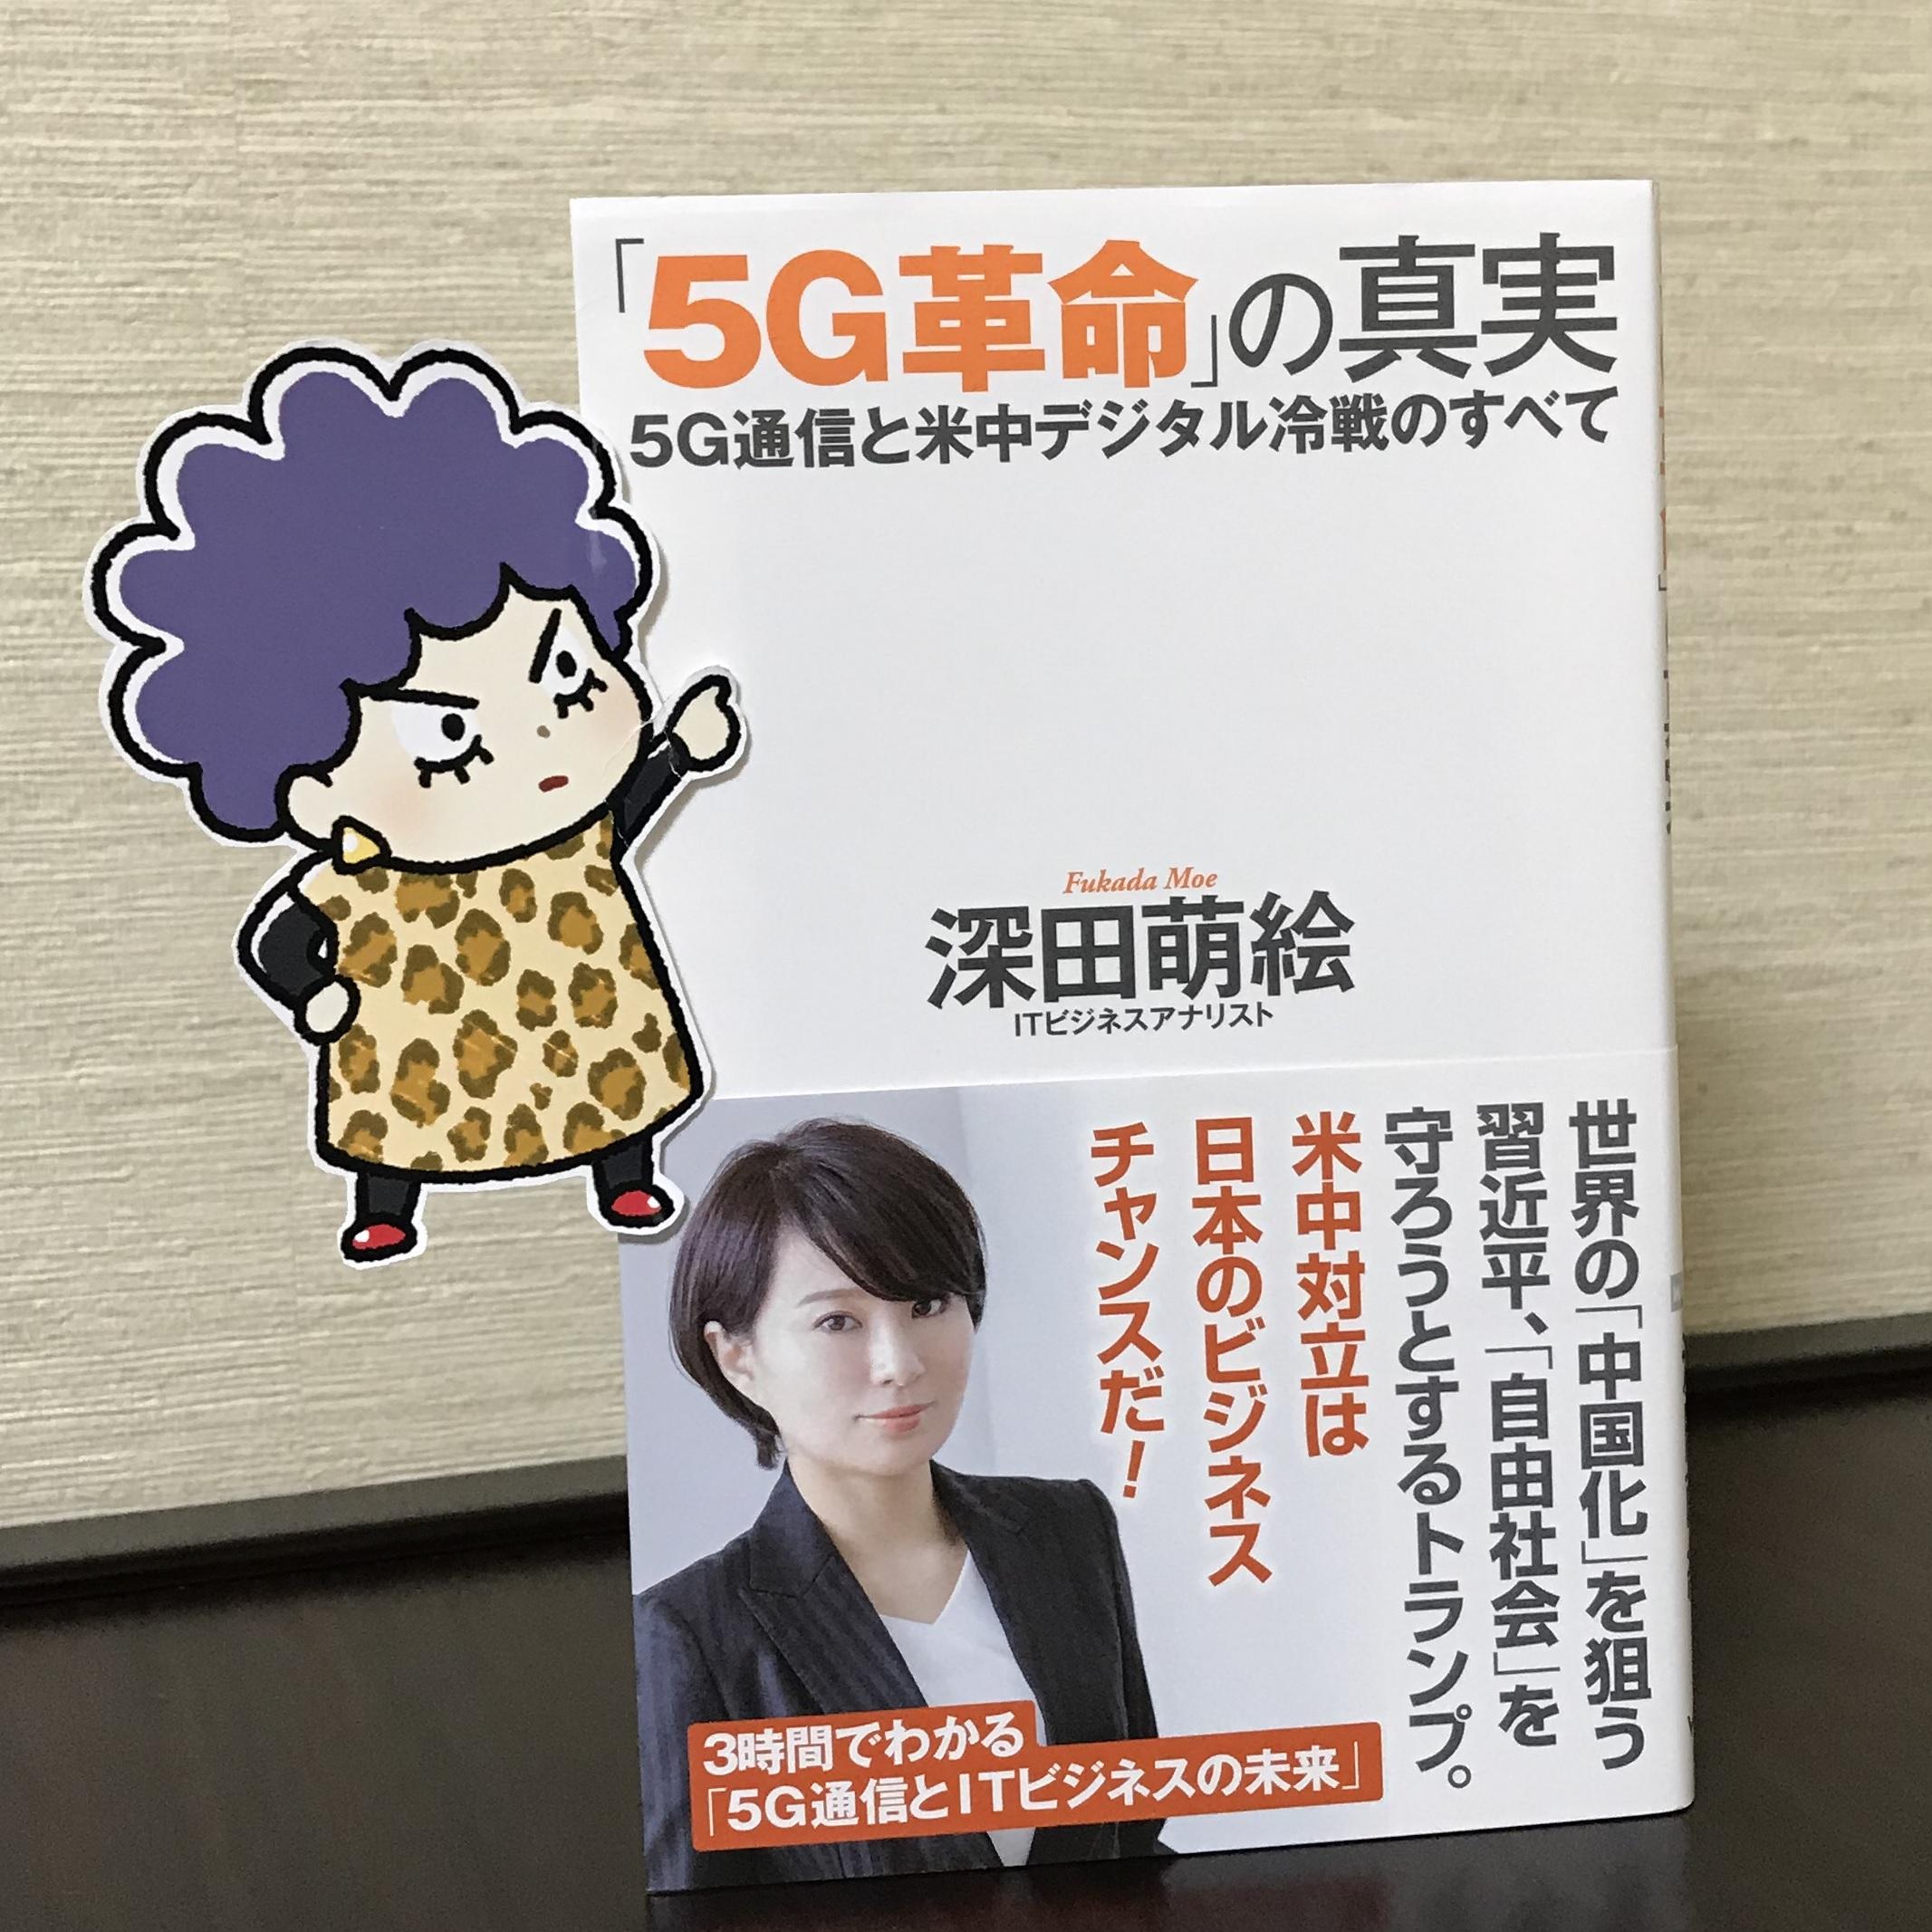 「5G革命」の真実深田萌絵